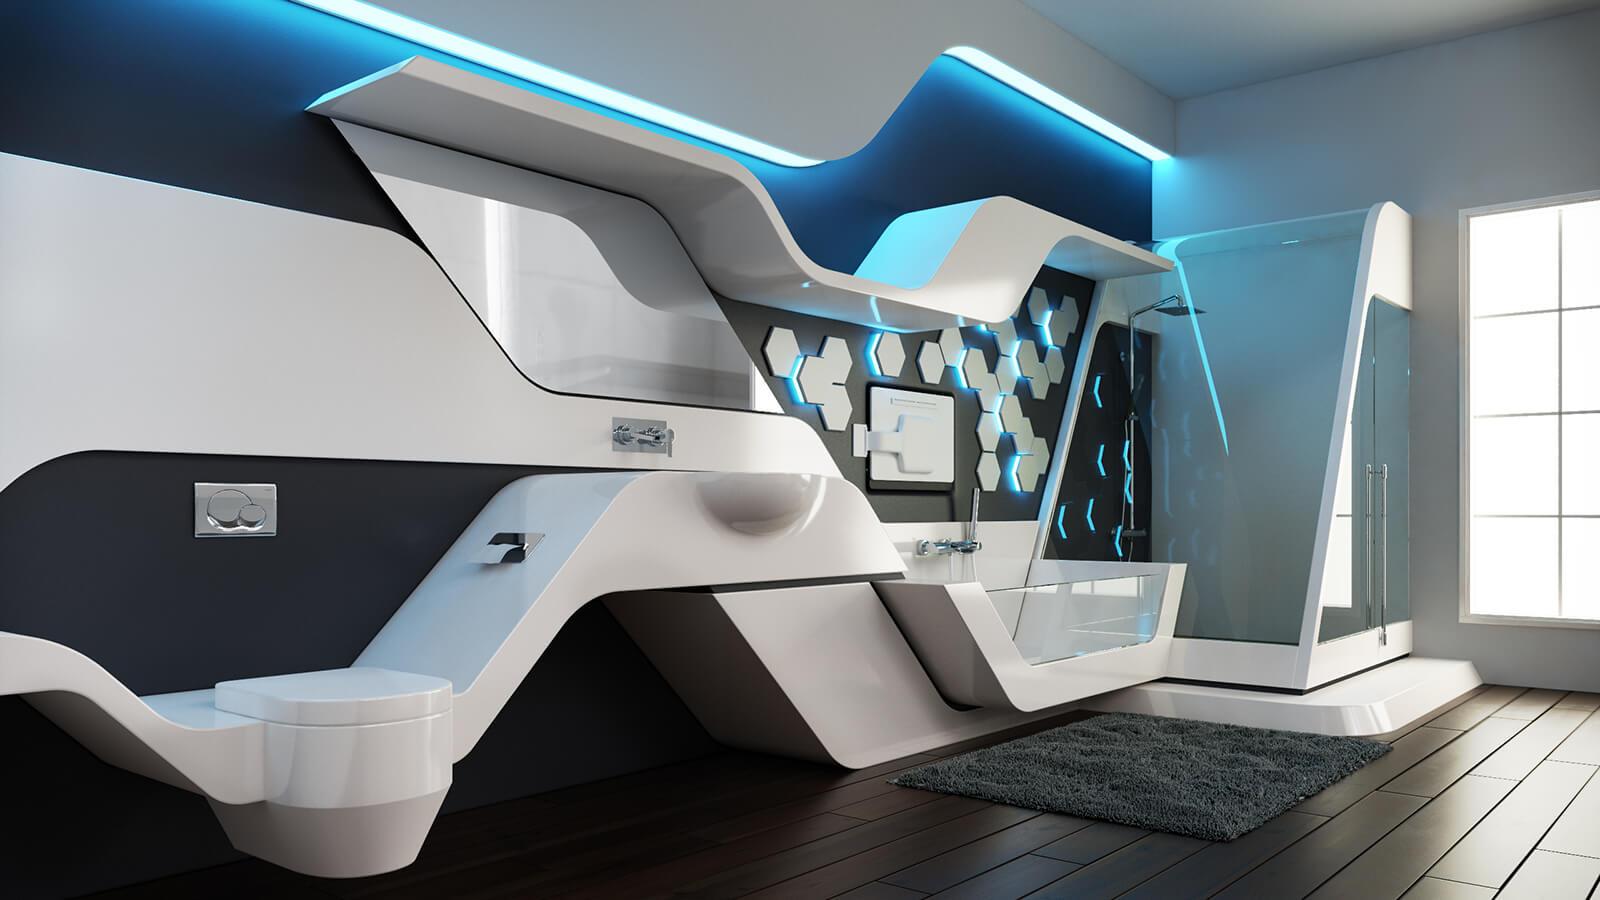 Futuristic Luxurious Bathrooms: Futuristic Bathroom Suite & Kitchen Sinks